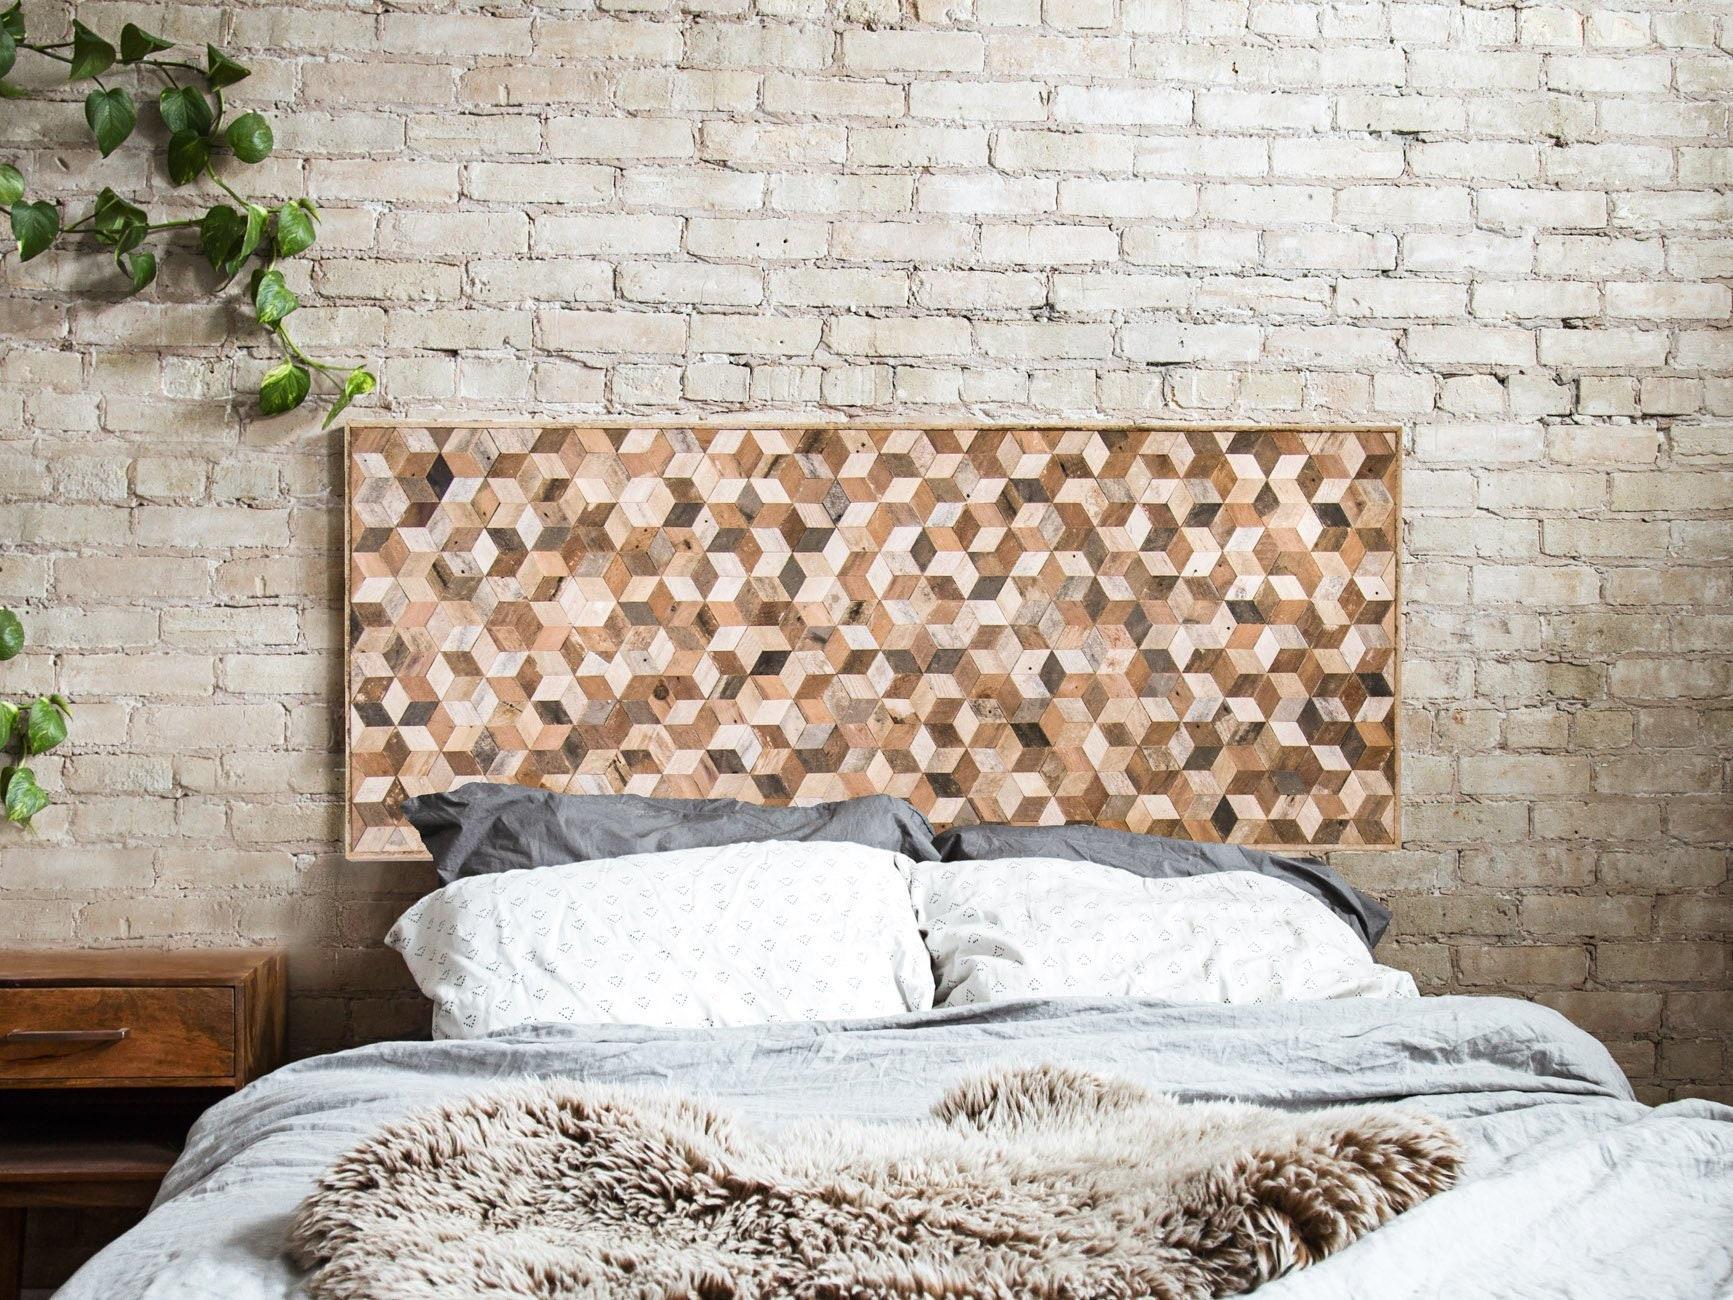 Reclaimed Wood Wall Art Wood Wall Decor Geometric Pattern Queen Headboard Large Wall Art Wood Wall Art Minimalist Modern Art 60 X 24